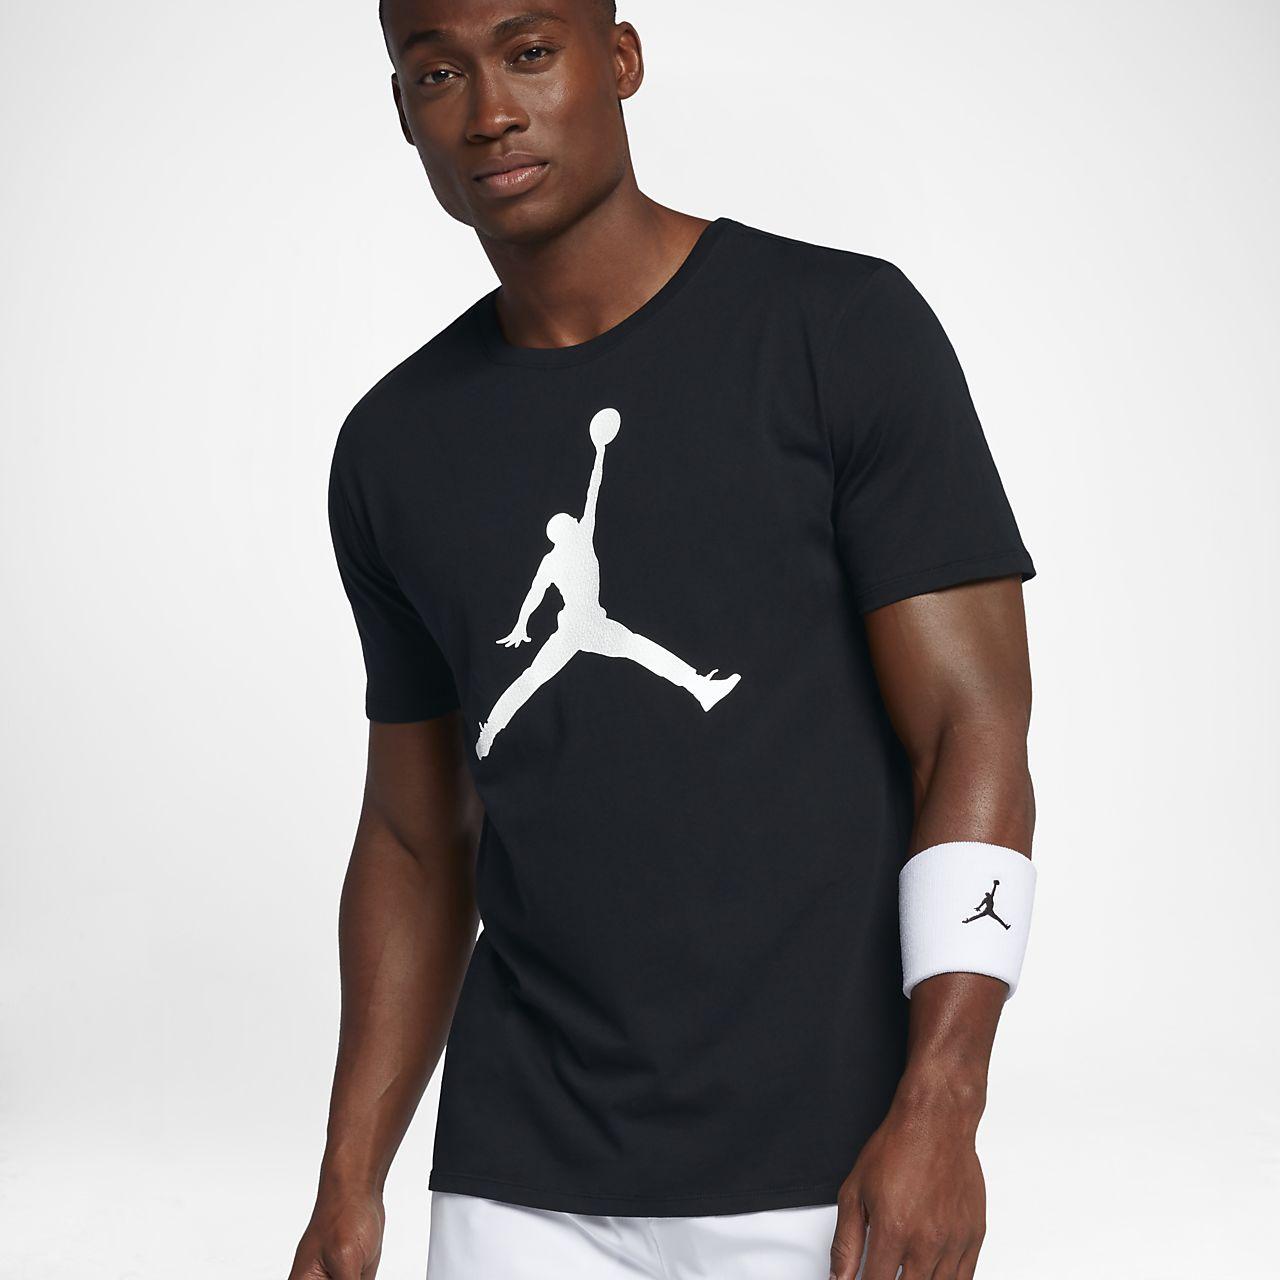 a25d6a70a70b2e Jordan Lifestyle Iconic Jumpman Men s T-Shirt. Nike.com IN